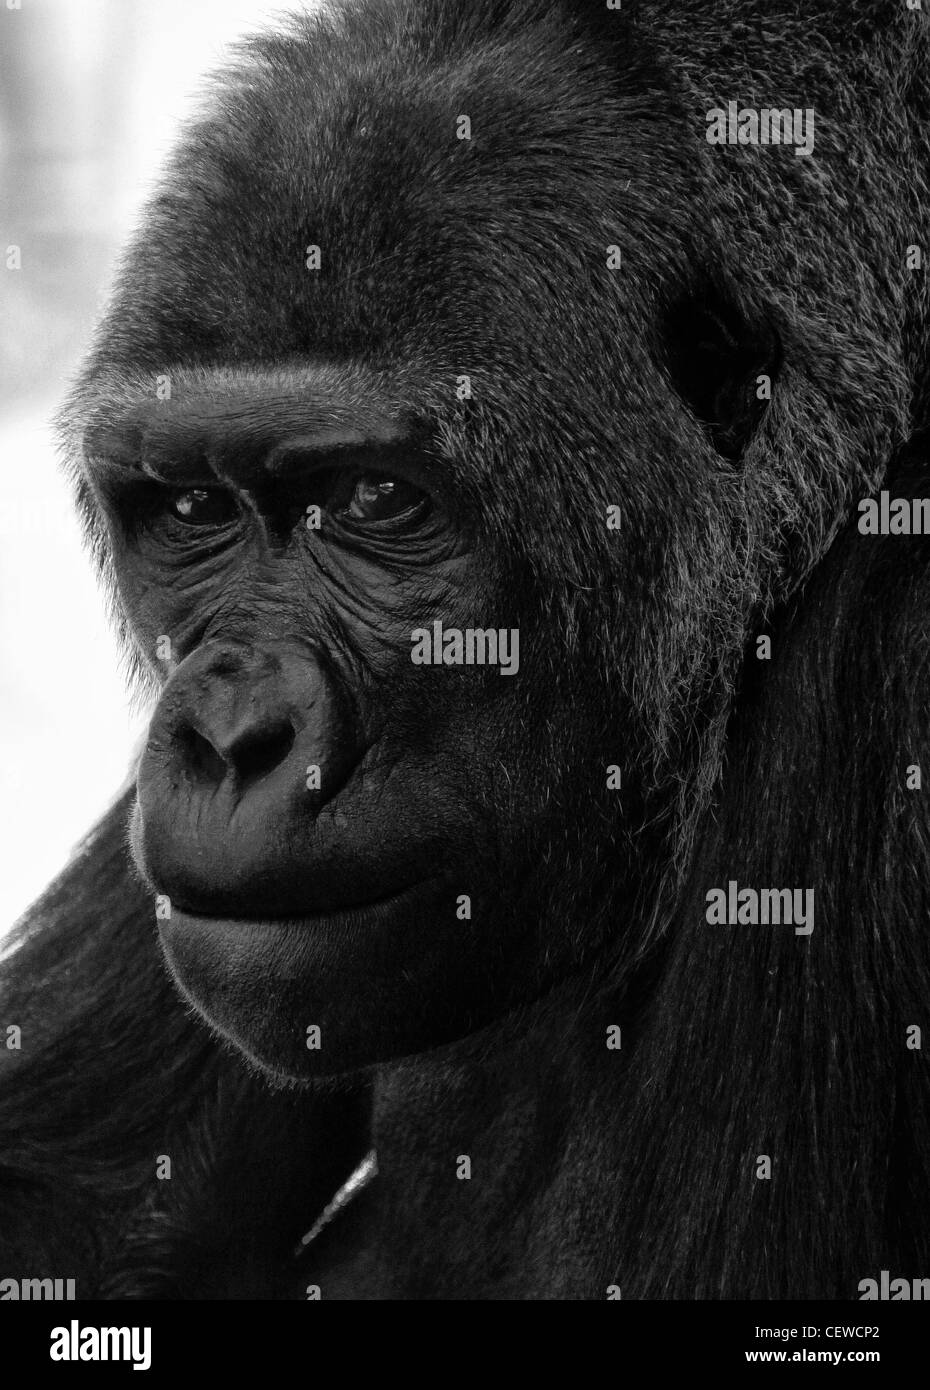 Gorilla in contemplation - Stock Image